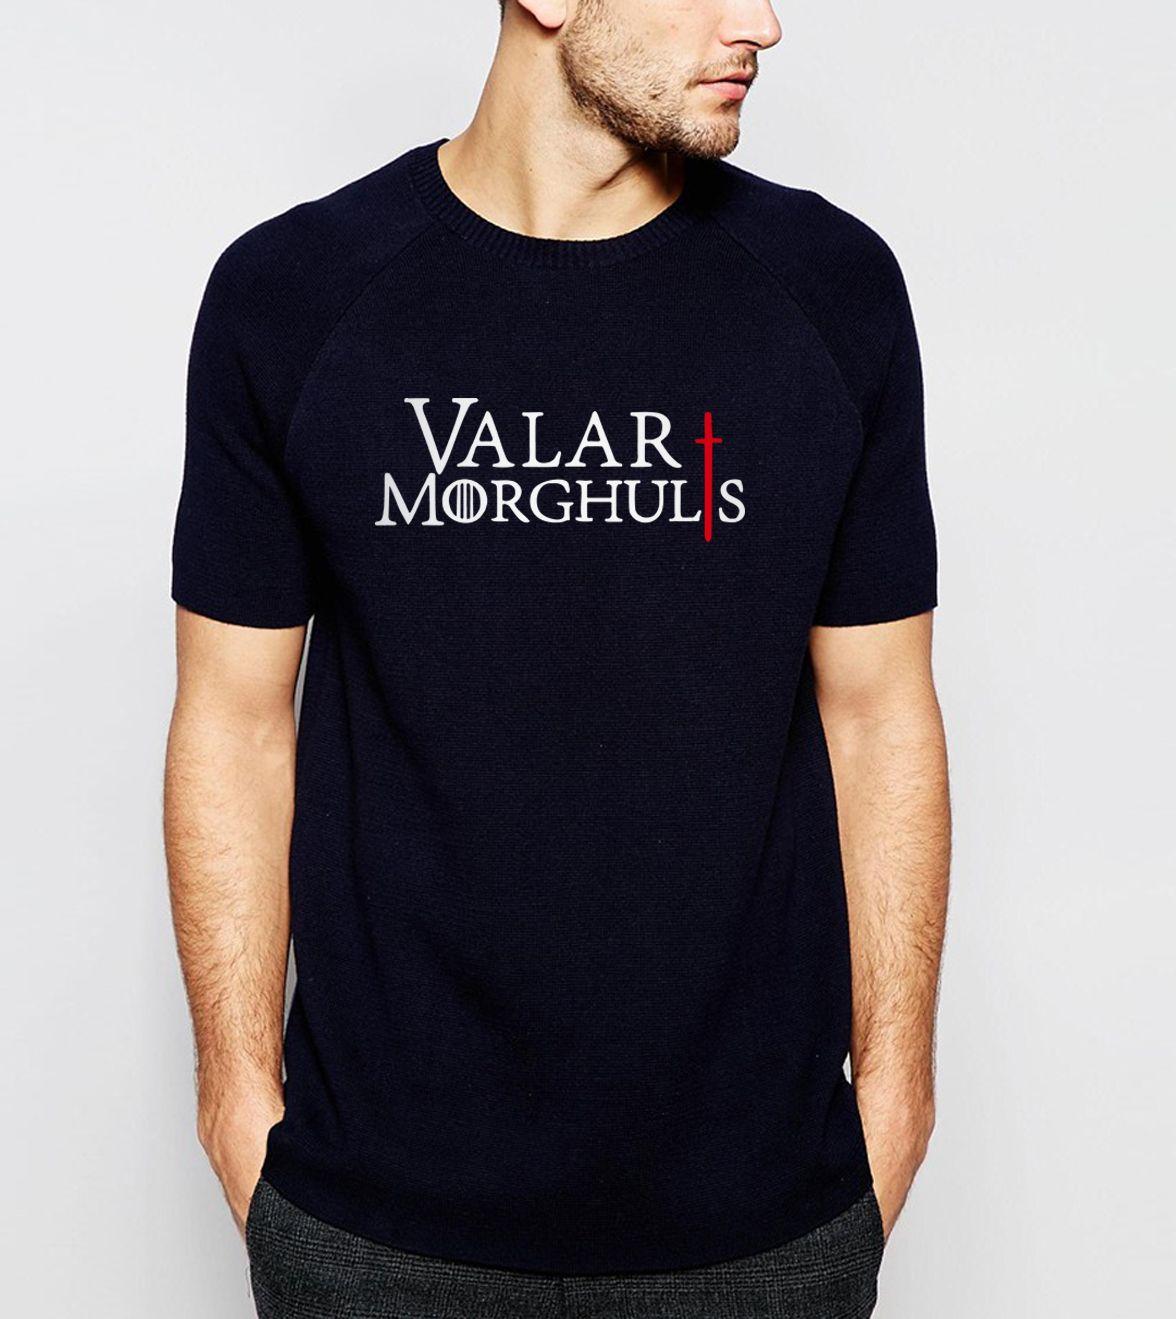 2eb11438b 312 Most inspiring Men's Tops & Tees images   Mens tops, Shirt price, T  shirt men